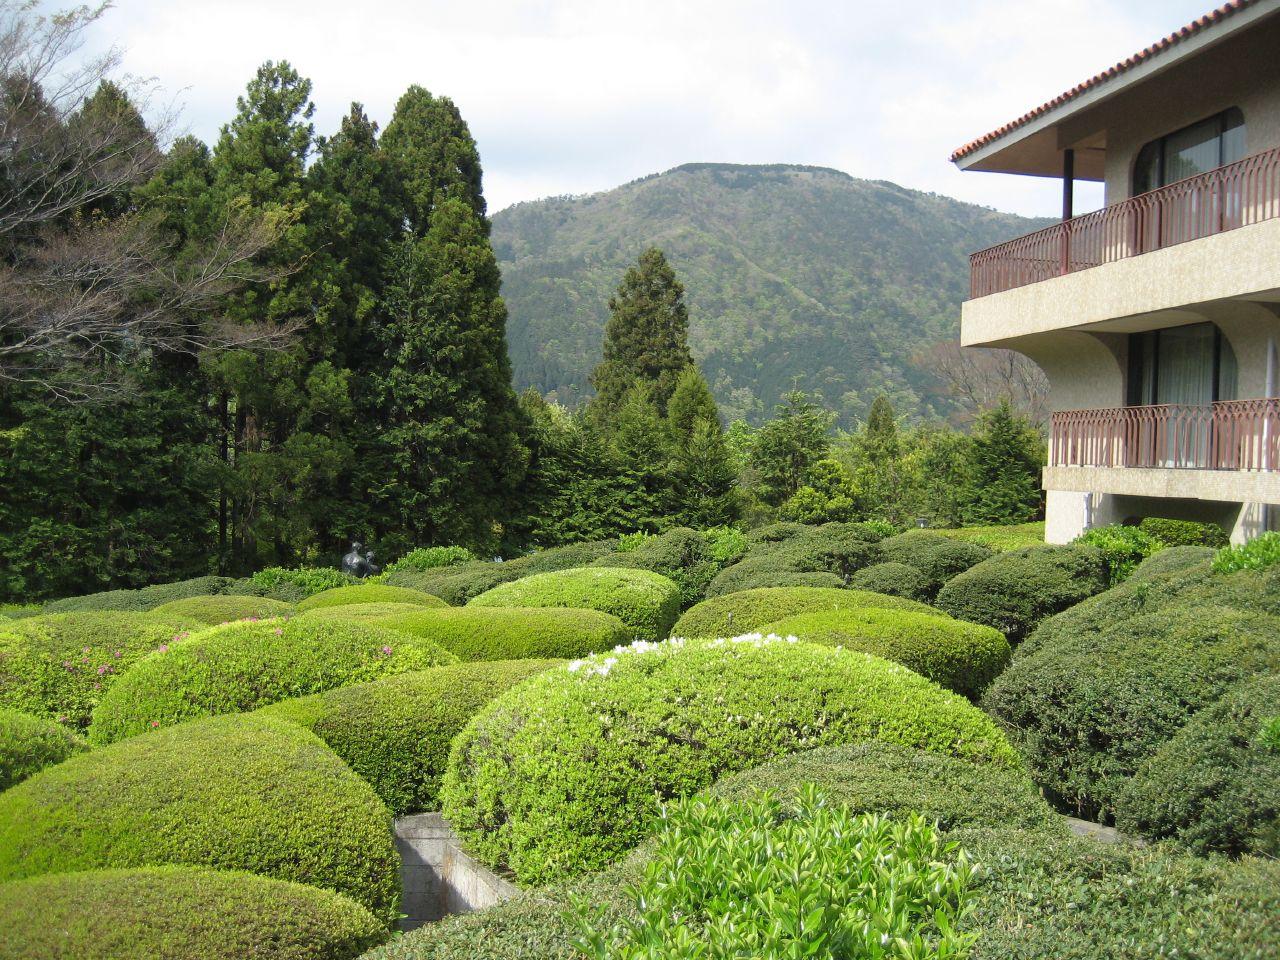 File:Hakone open air museum (8).jpg - Wikimedia Commons